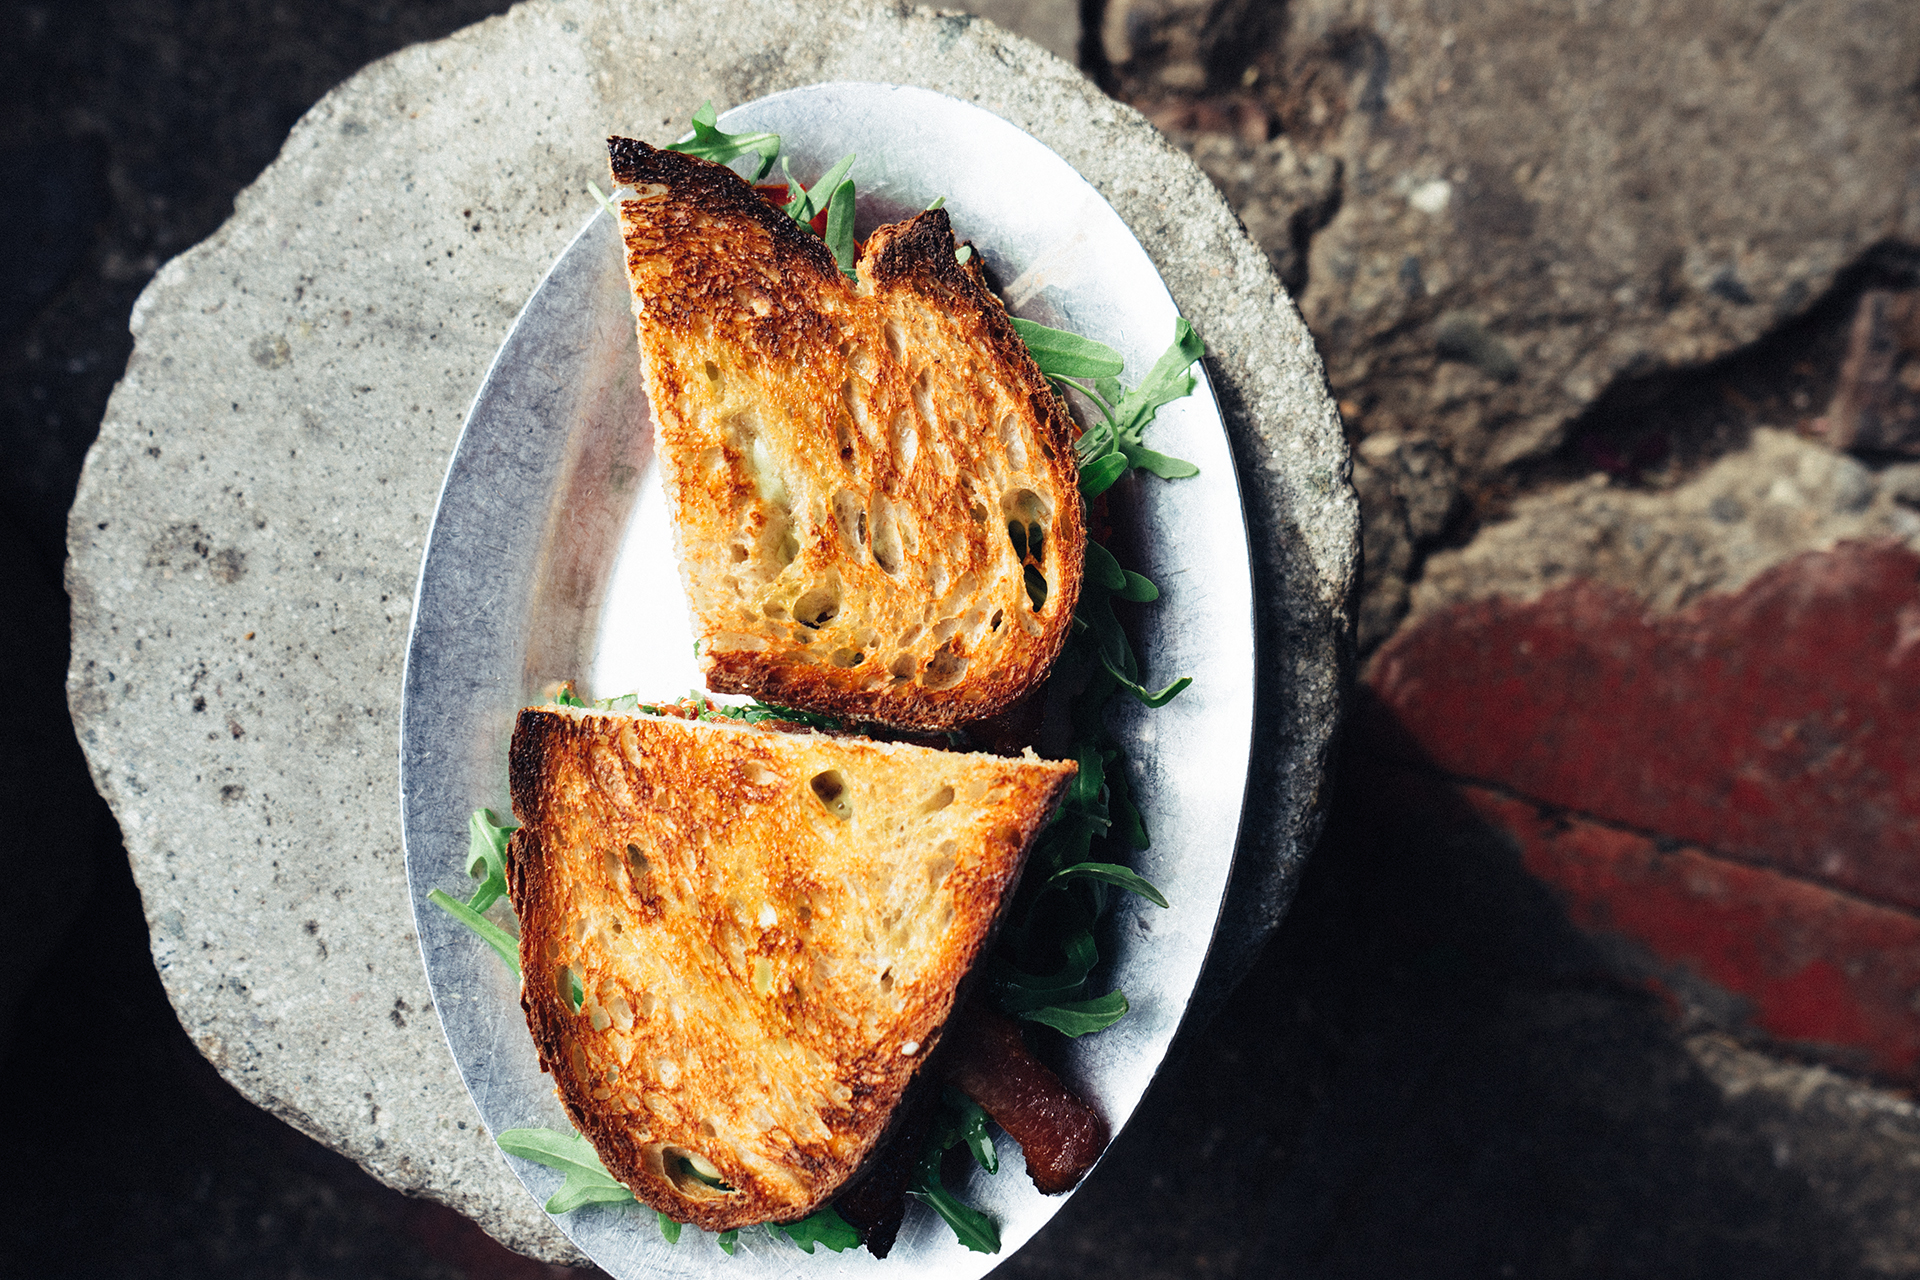 bread-food-plate-rucola.jpg